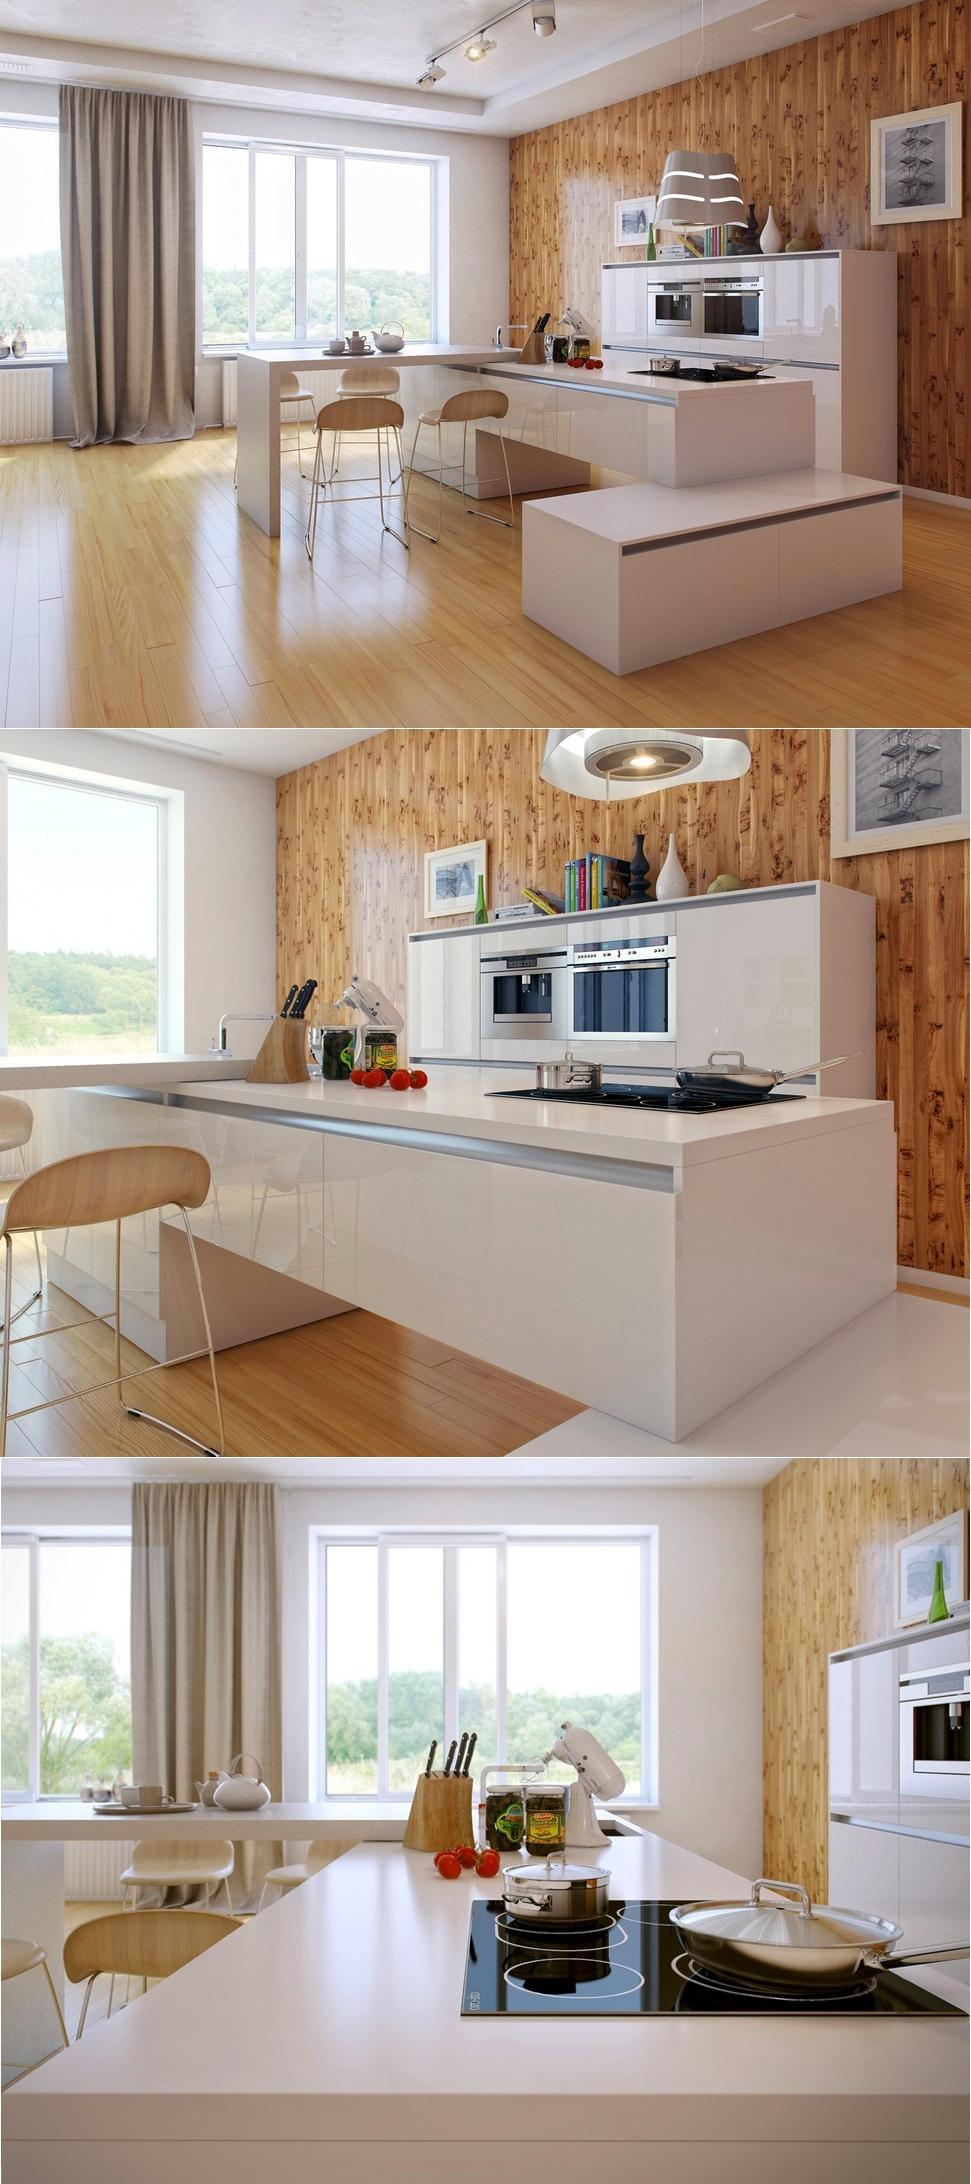 25 unique kitchen countertops - Kitchen countertop designs photos ...